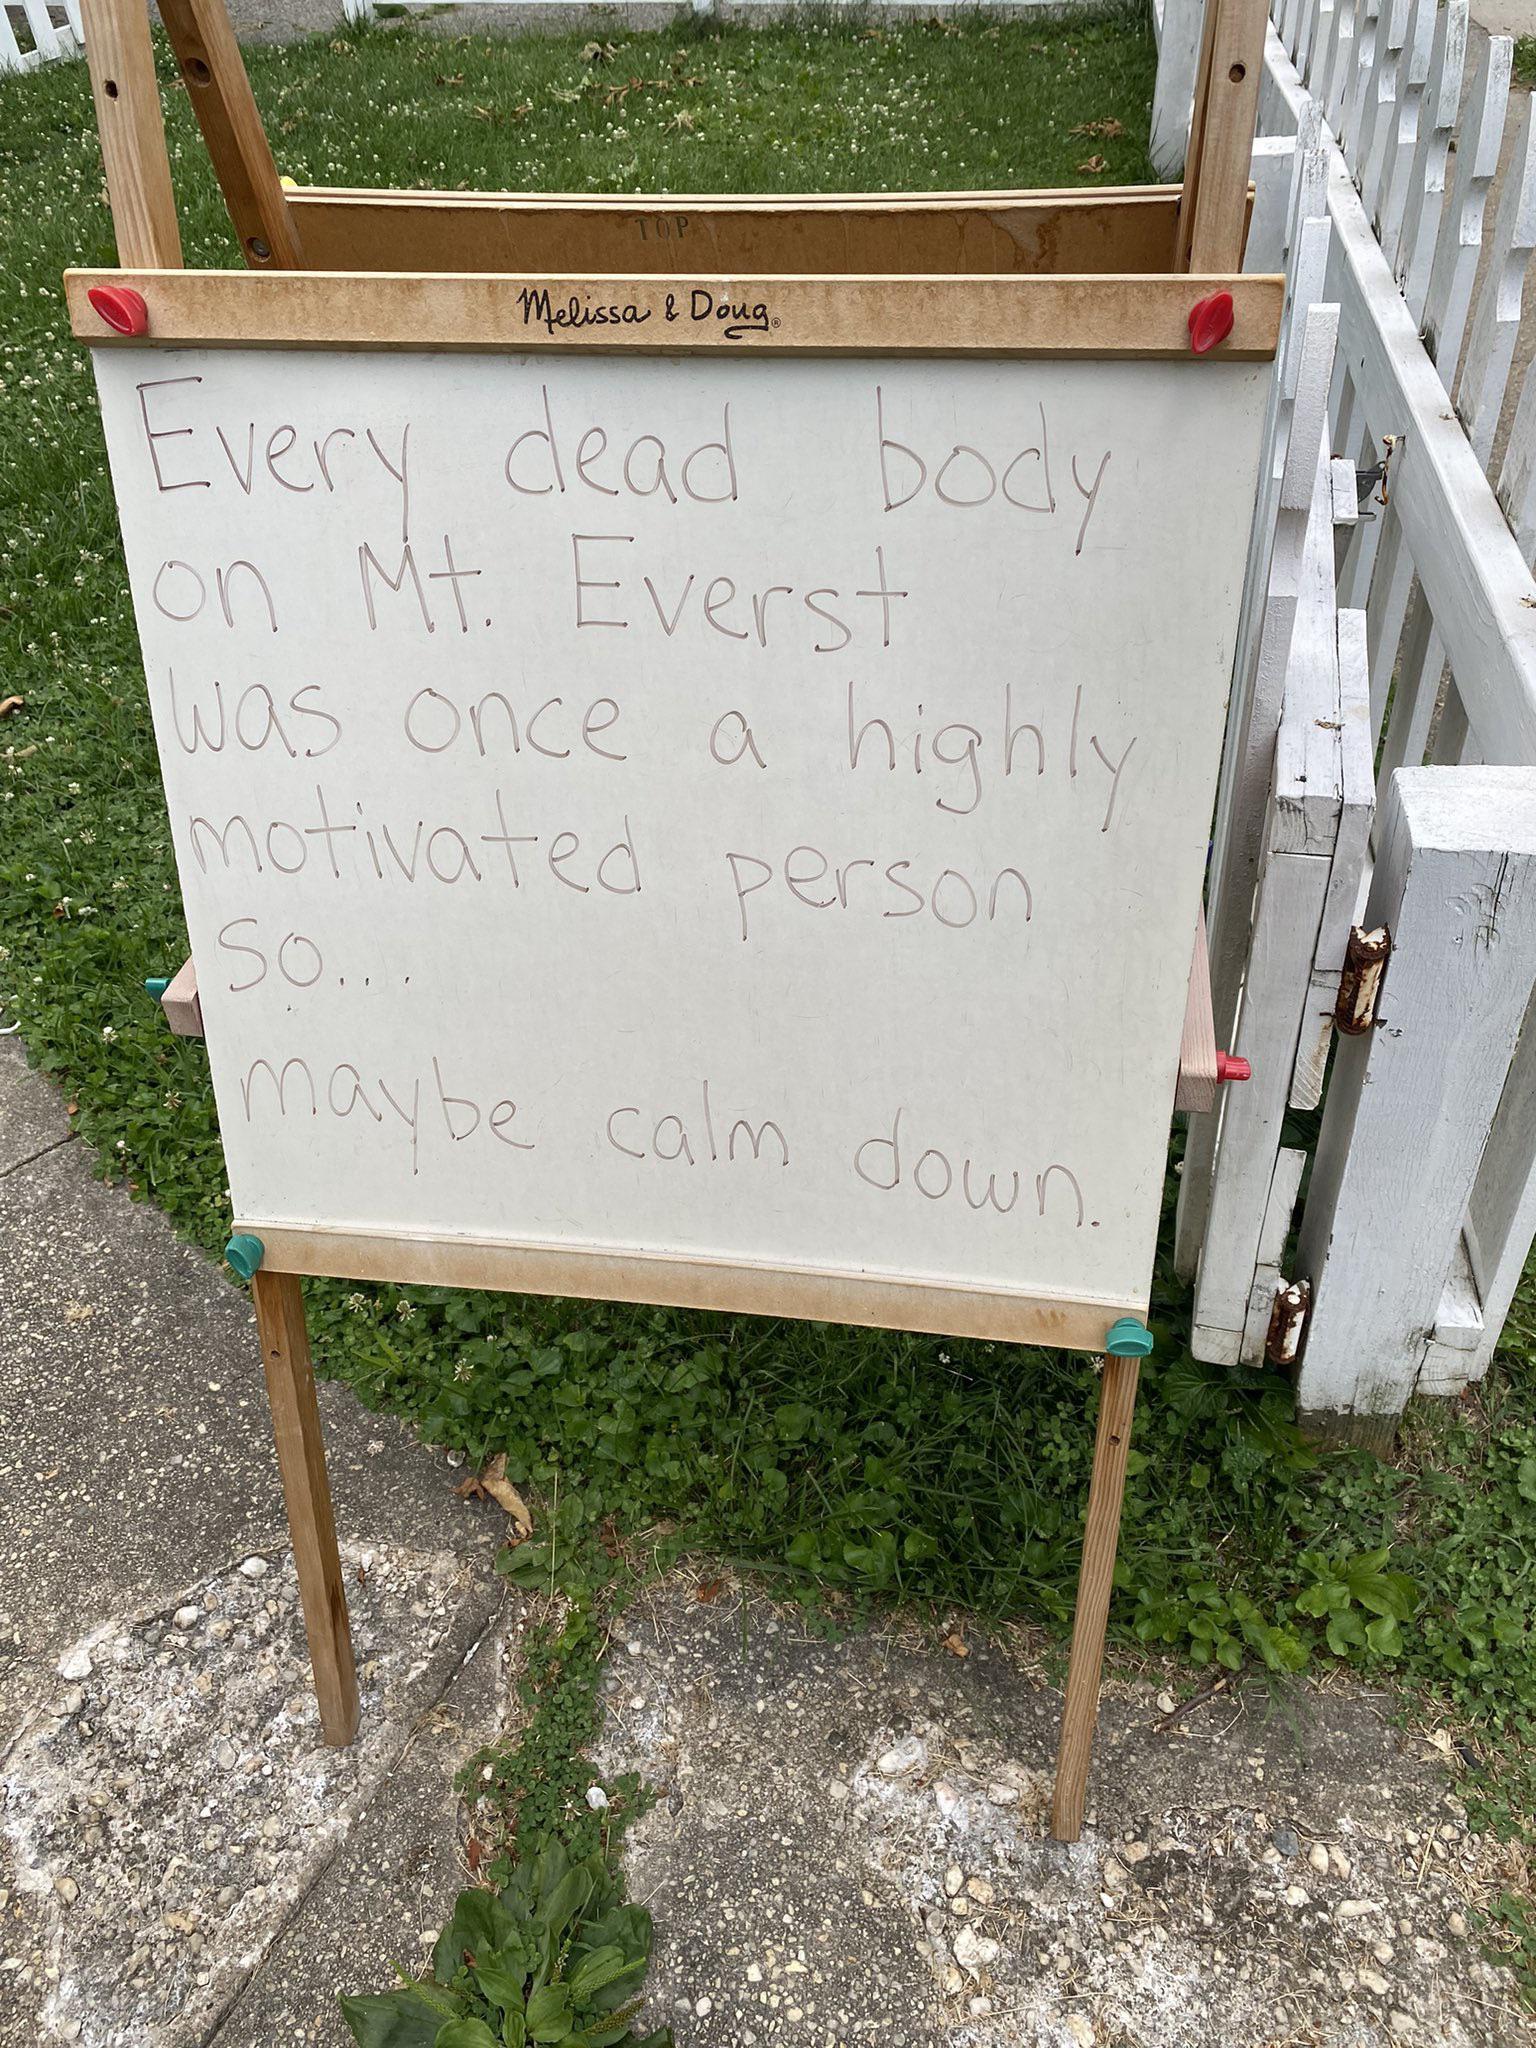 [image] Motivation from the neighborhood